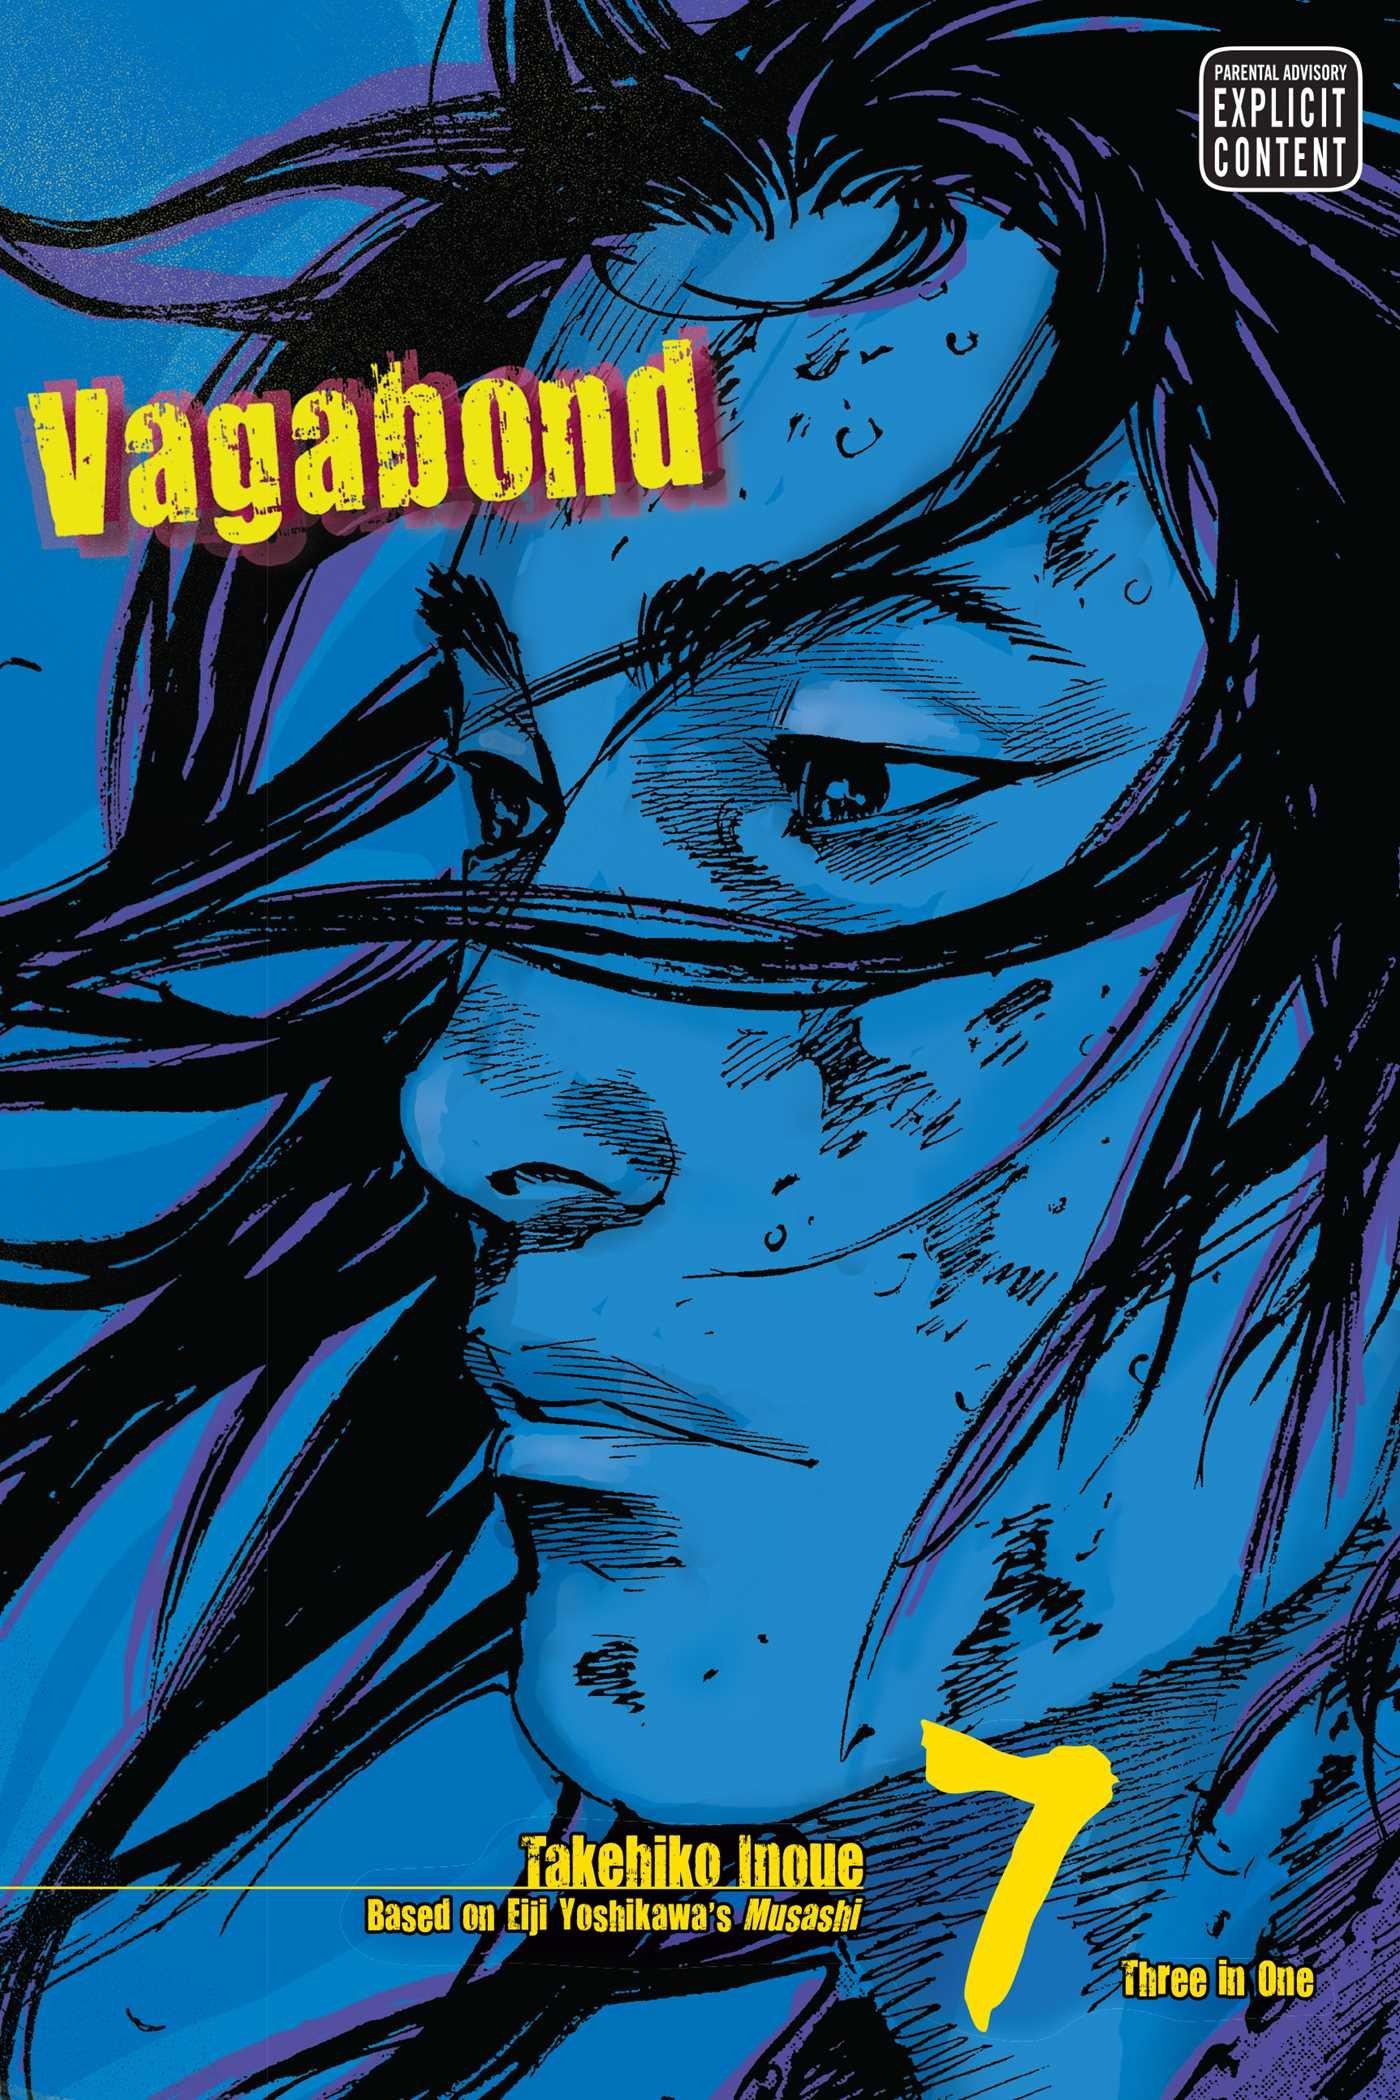 VAGABOND VIZBIG ED GN VOL 07  MR   C  1 0 1   Vagabond Vizbig Edition Band 7